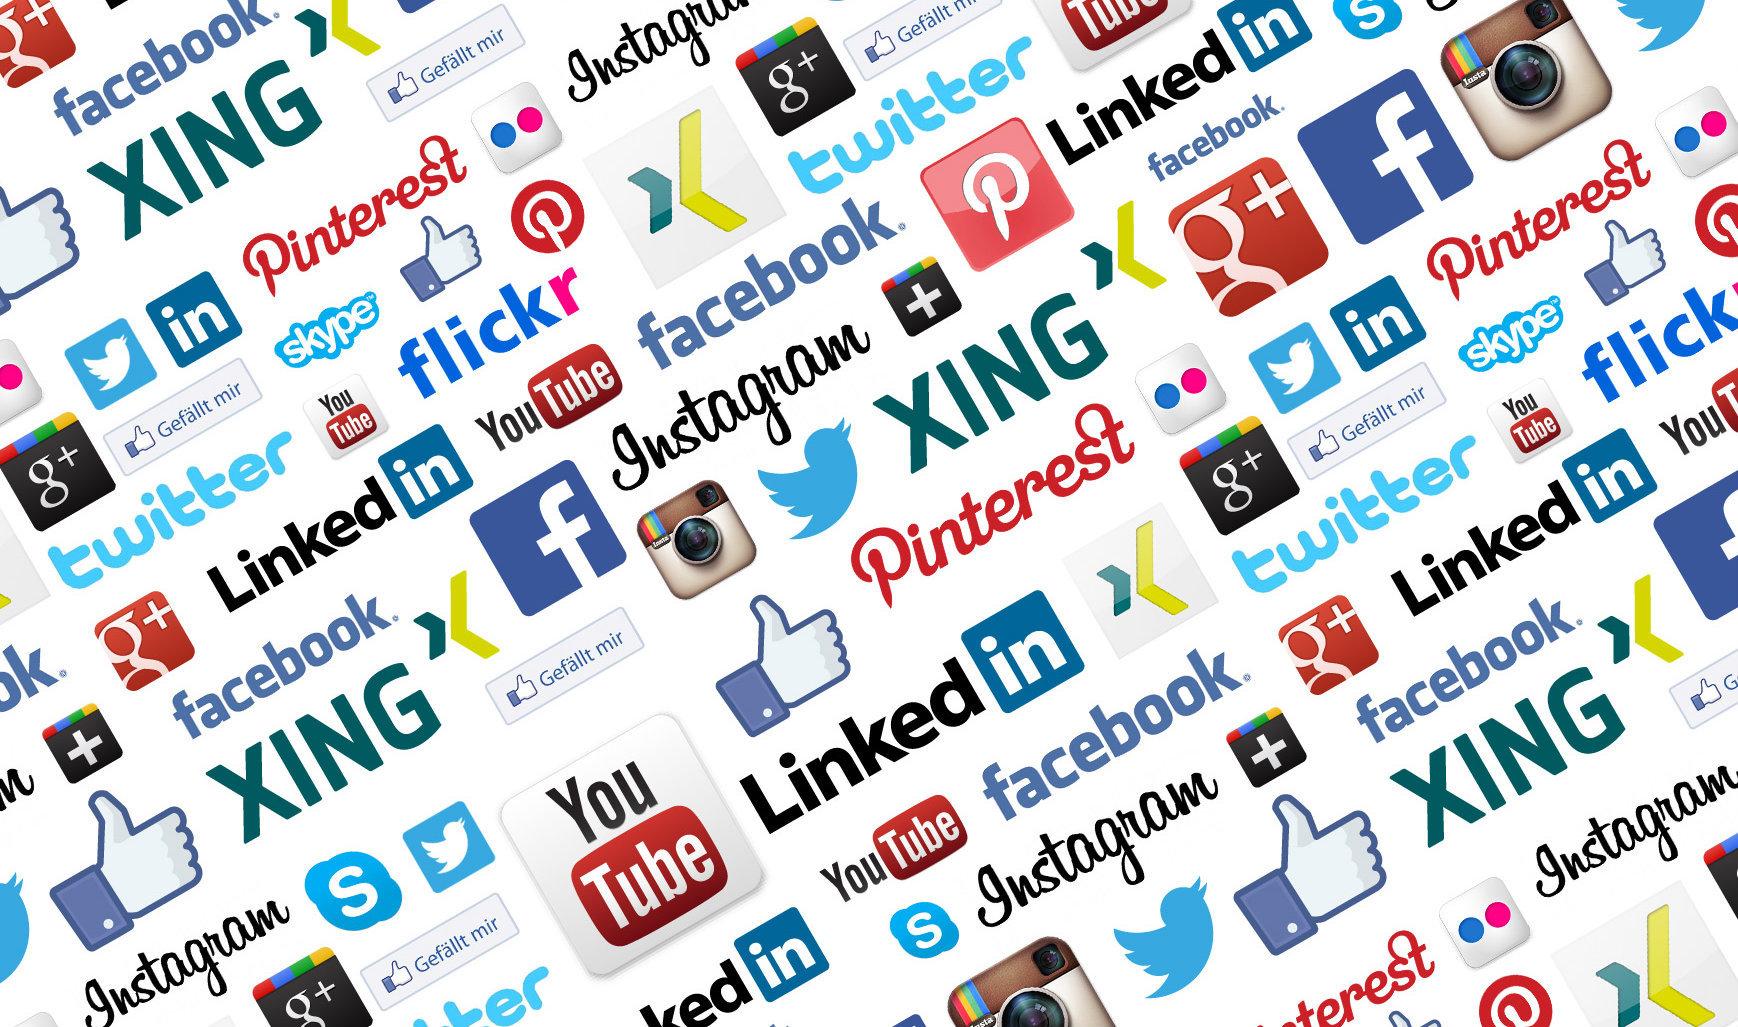 social-media-sites-pic